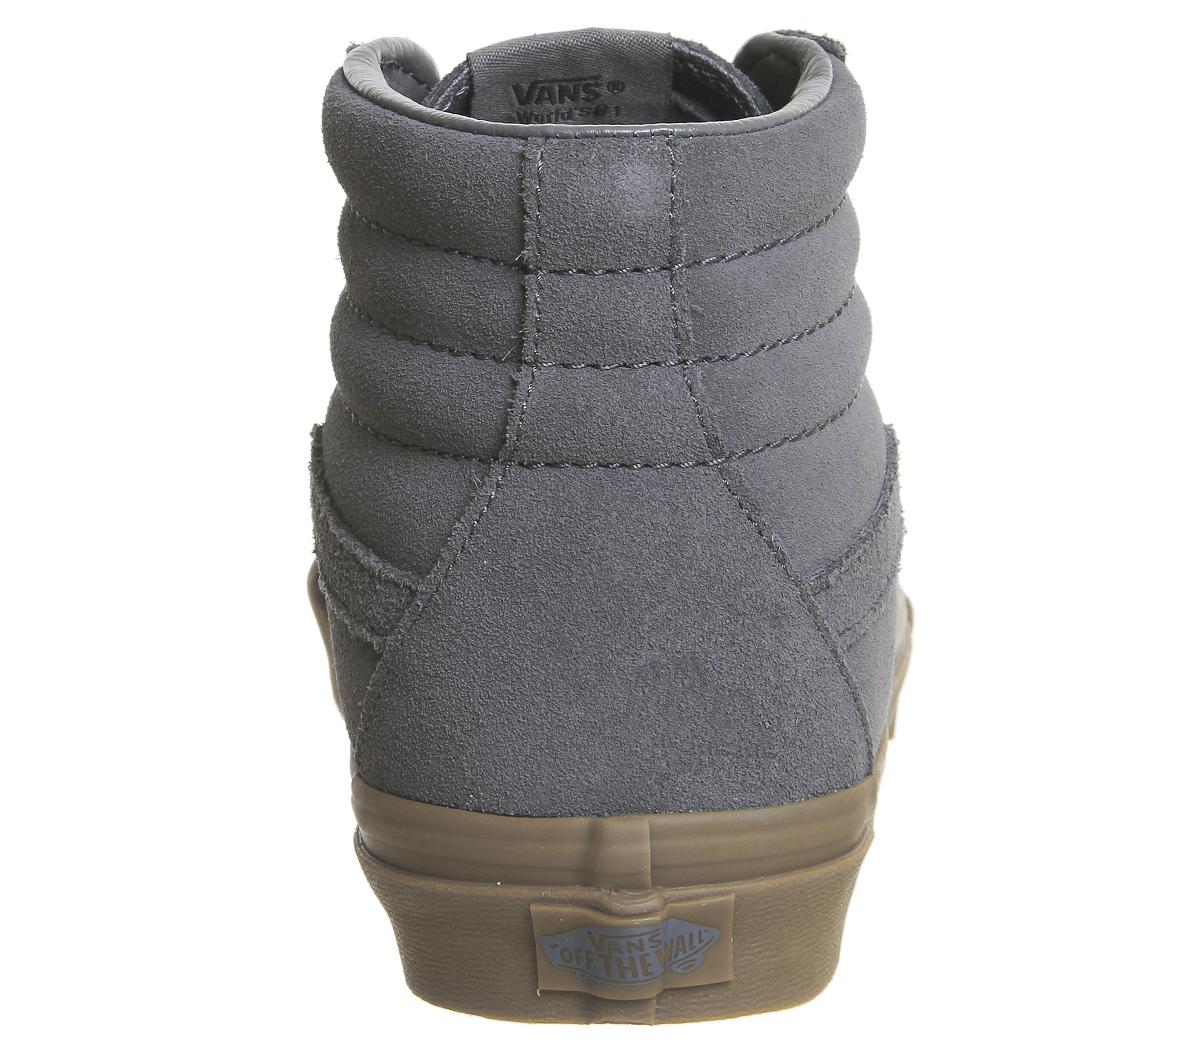 Hombre Vans Sk8 Sk8 Sk8 Hi Trainers Gris SUEDE GUM EXCLUSIVE Trainers Zapatos 93382d